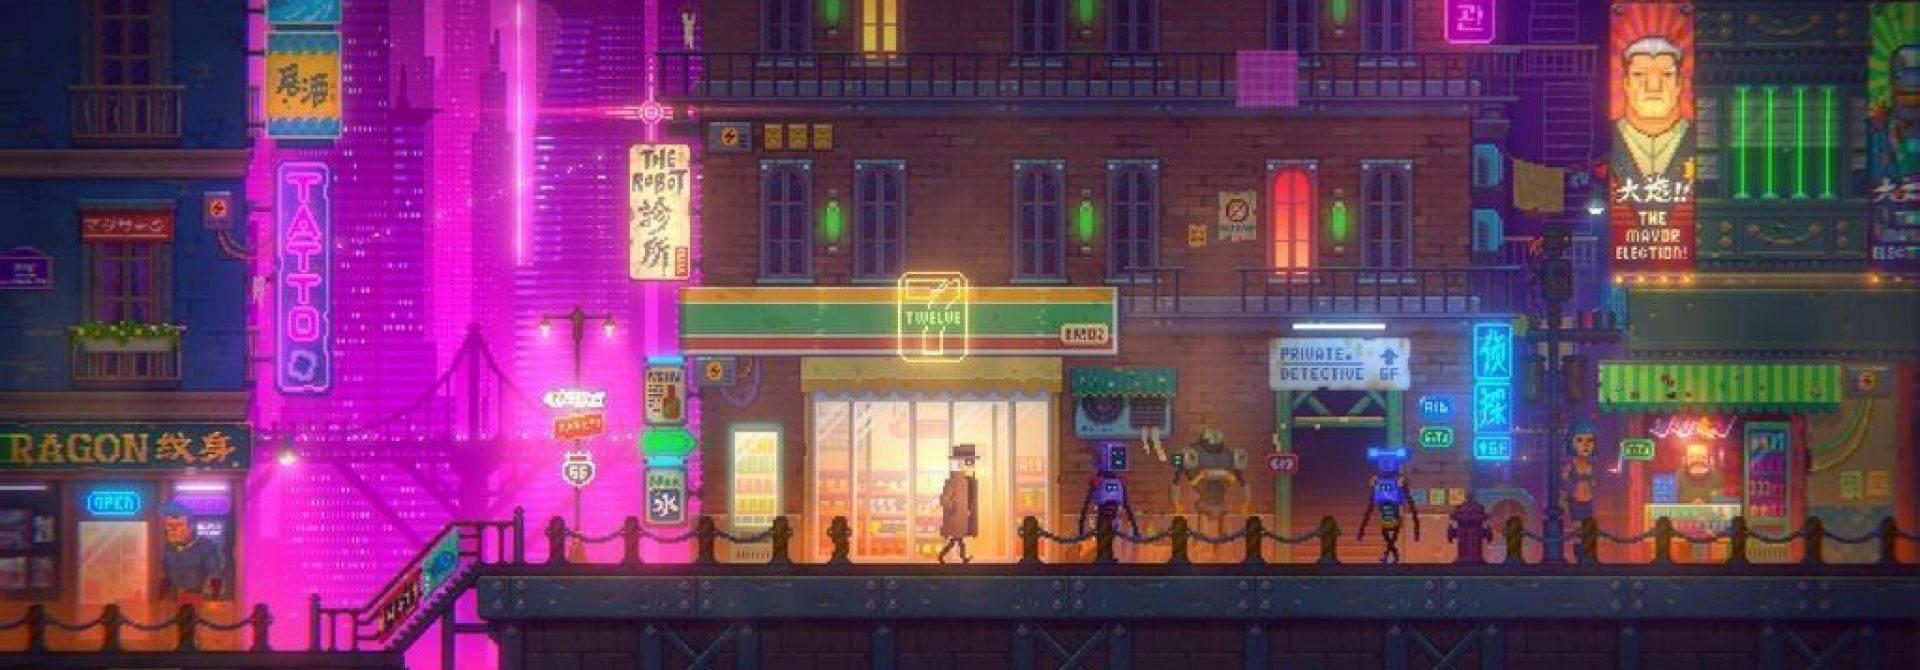 Tales Of The Neon Sea Has Almost Met Its Goal